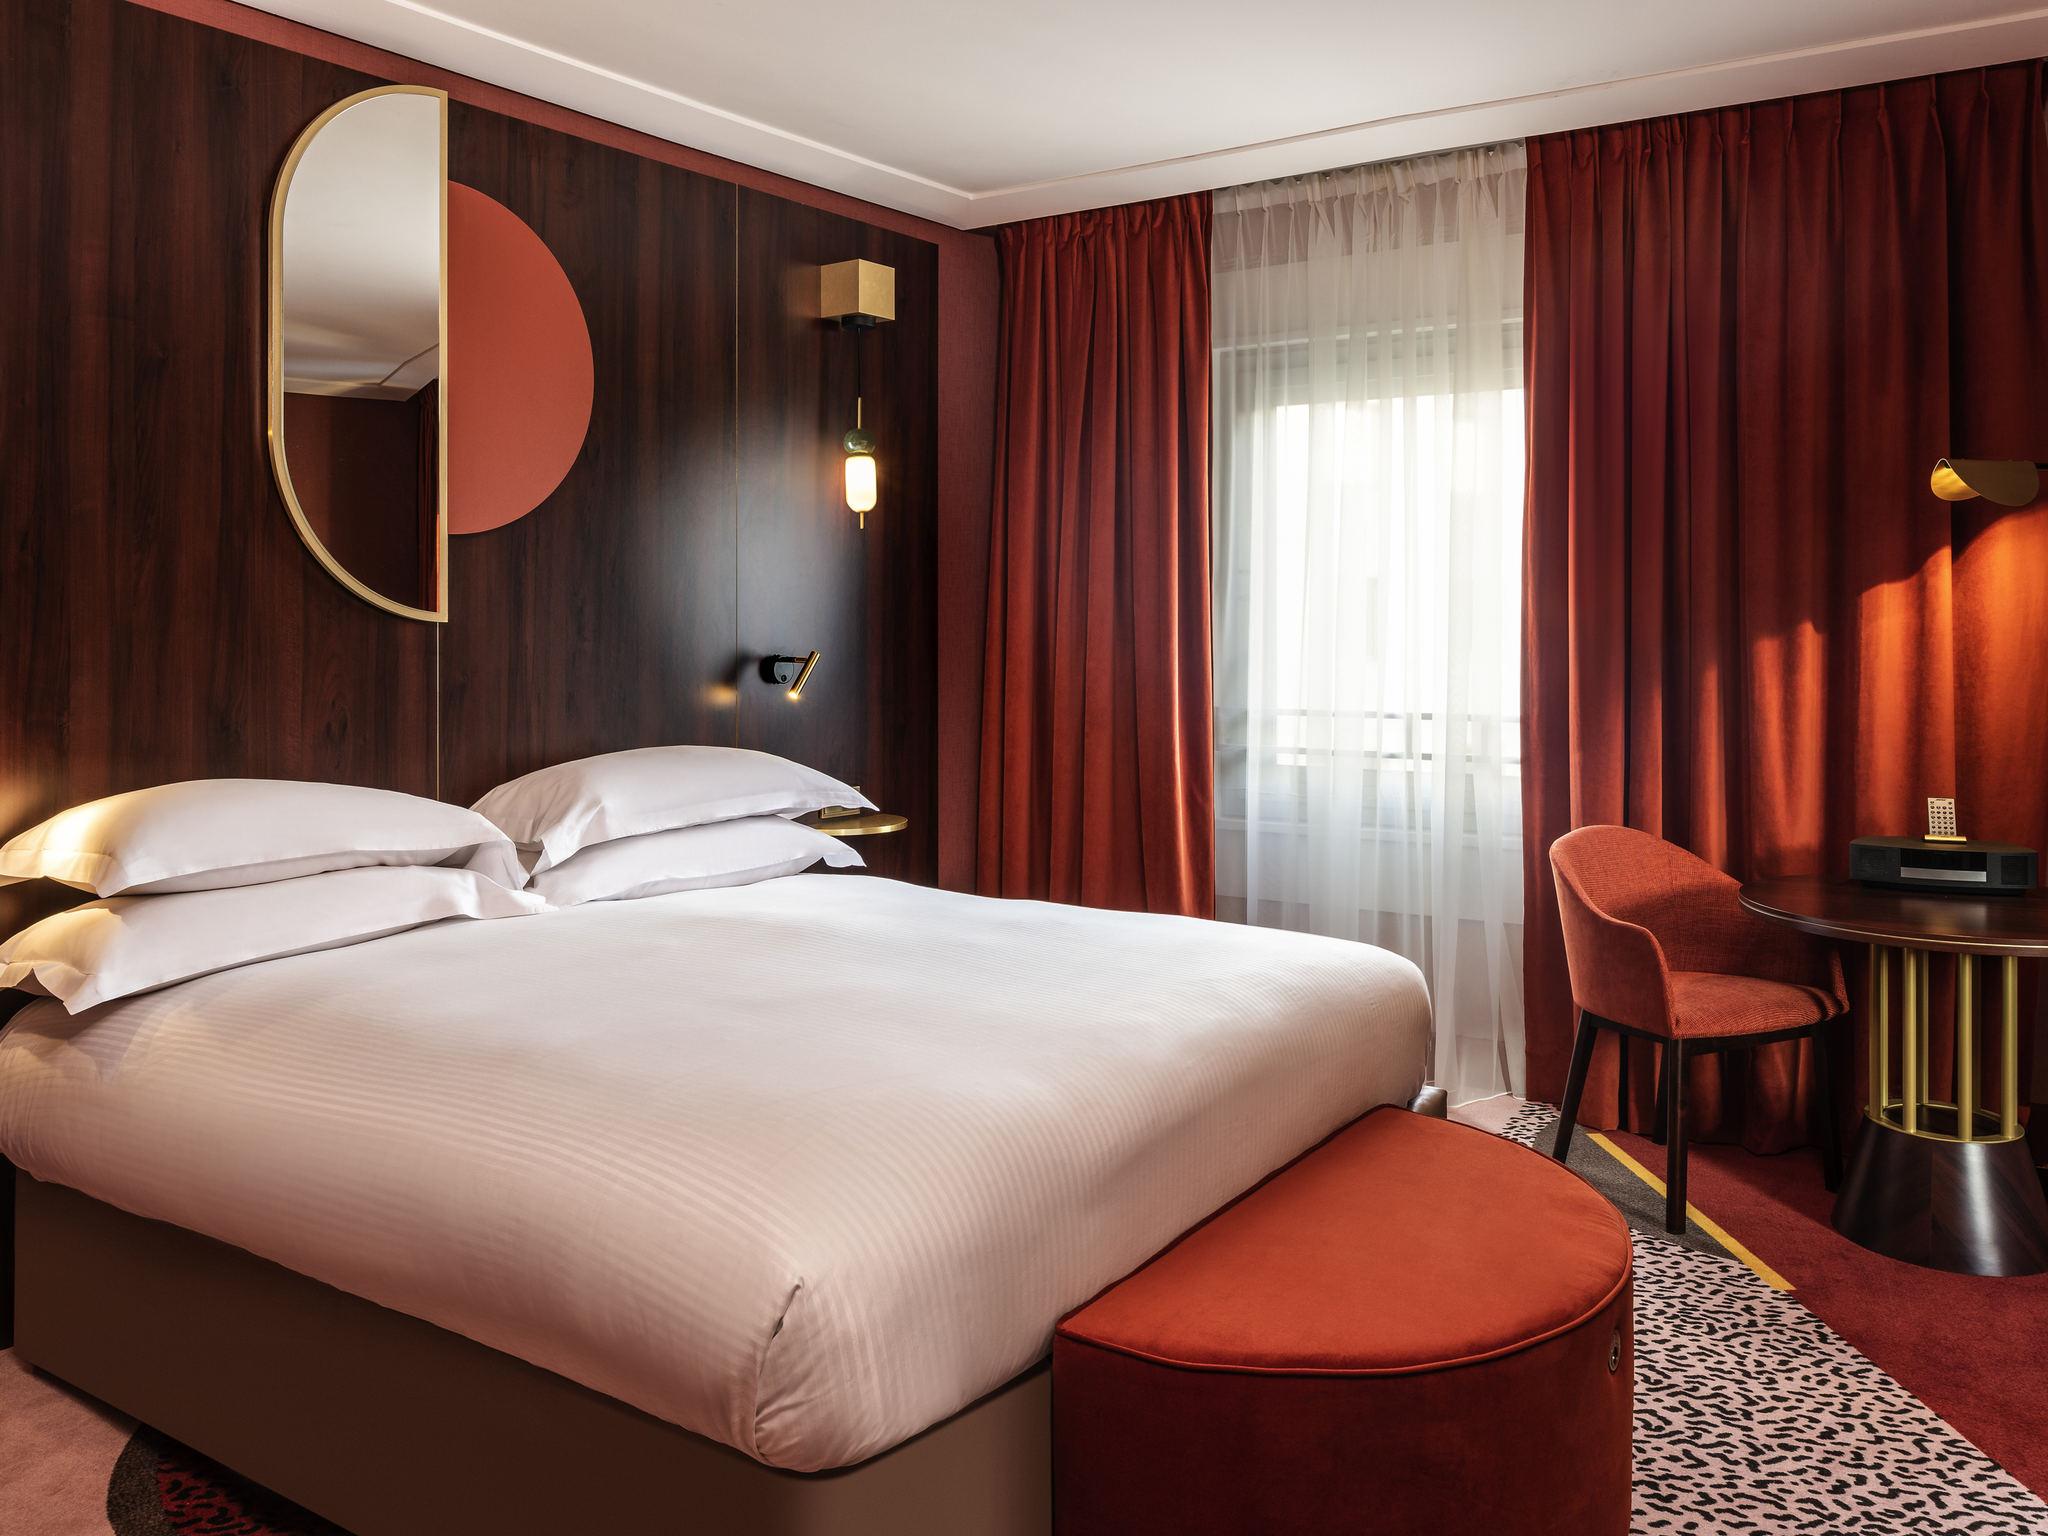 Hotel – Sofitel Paris La Défense